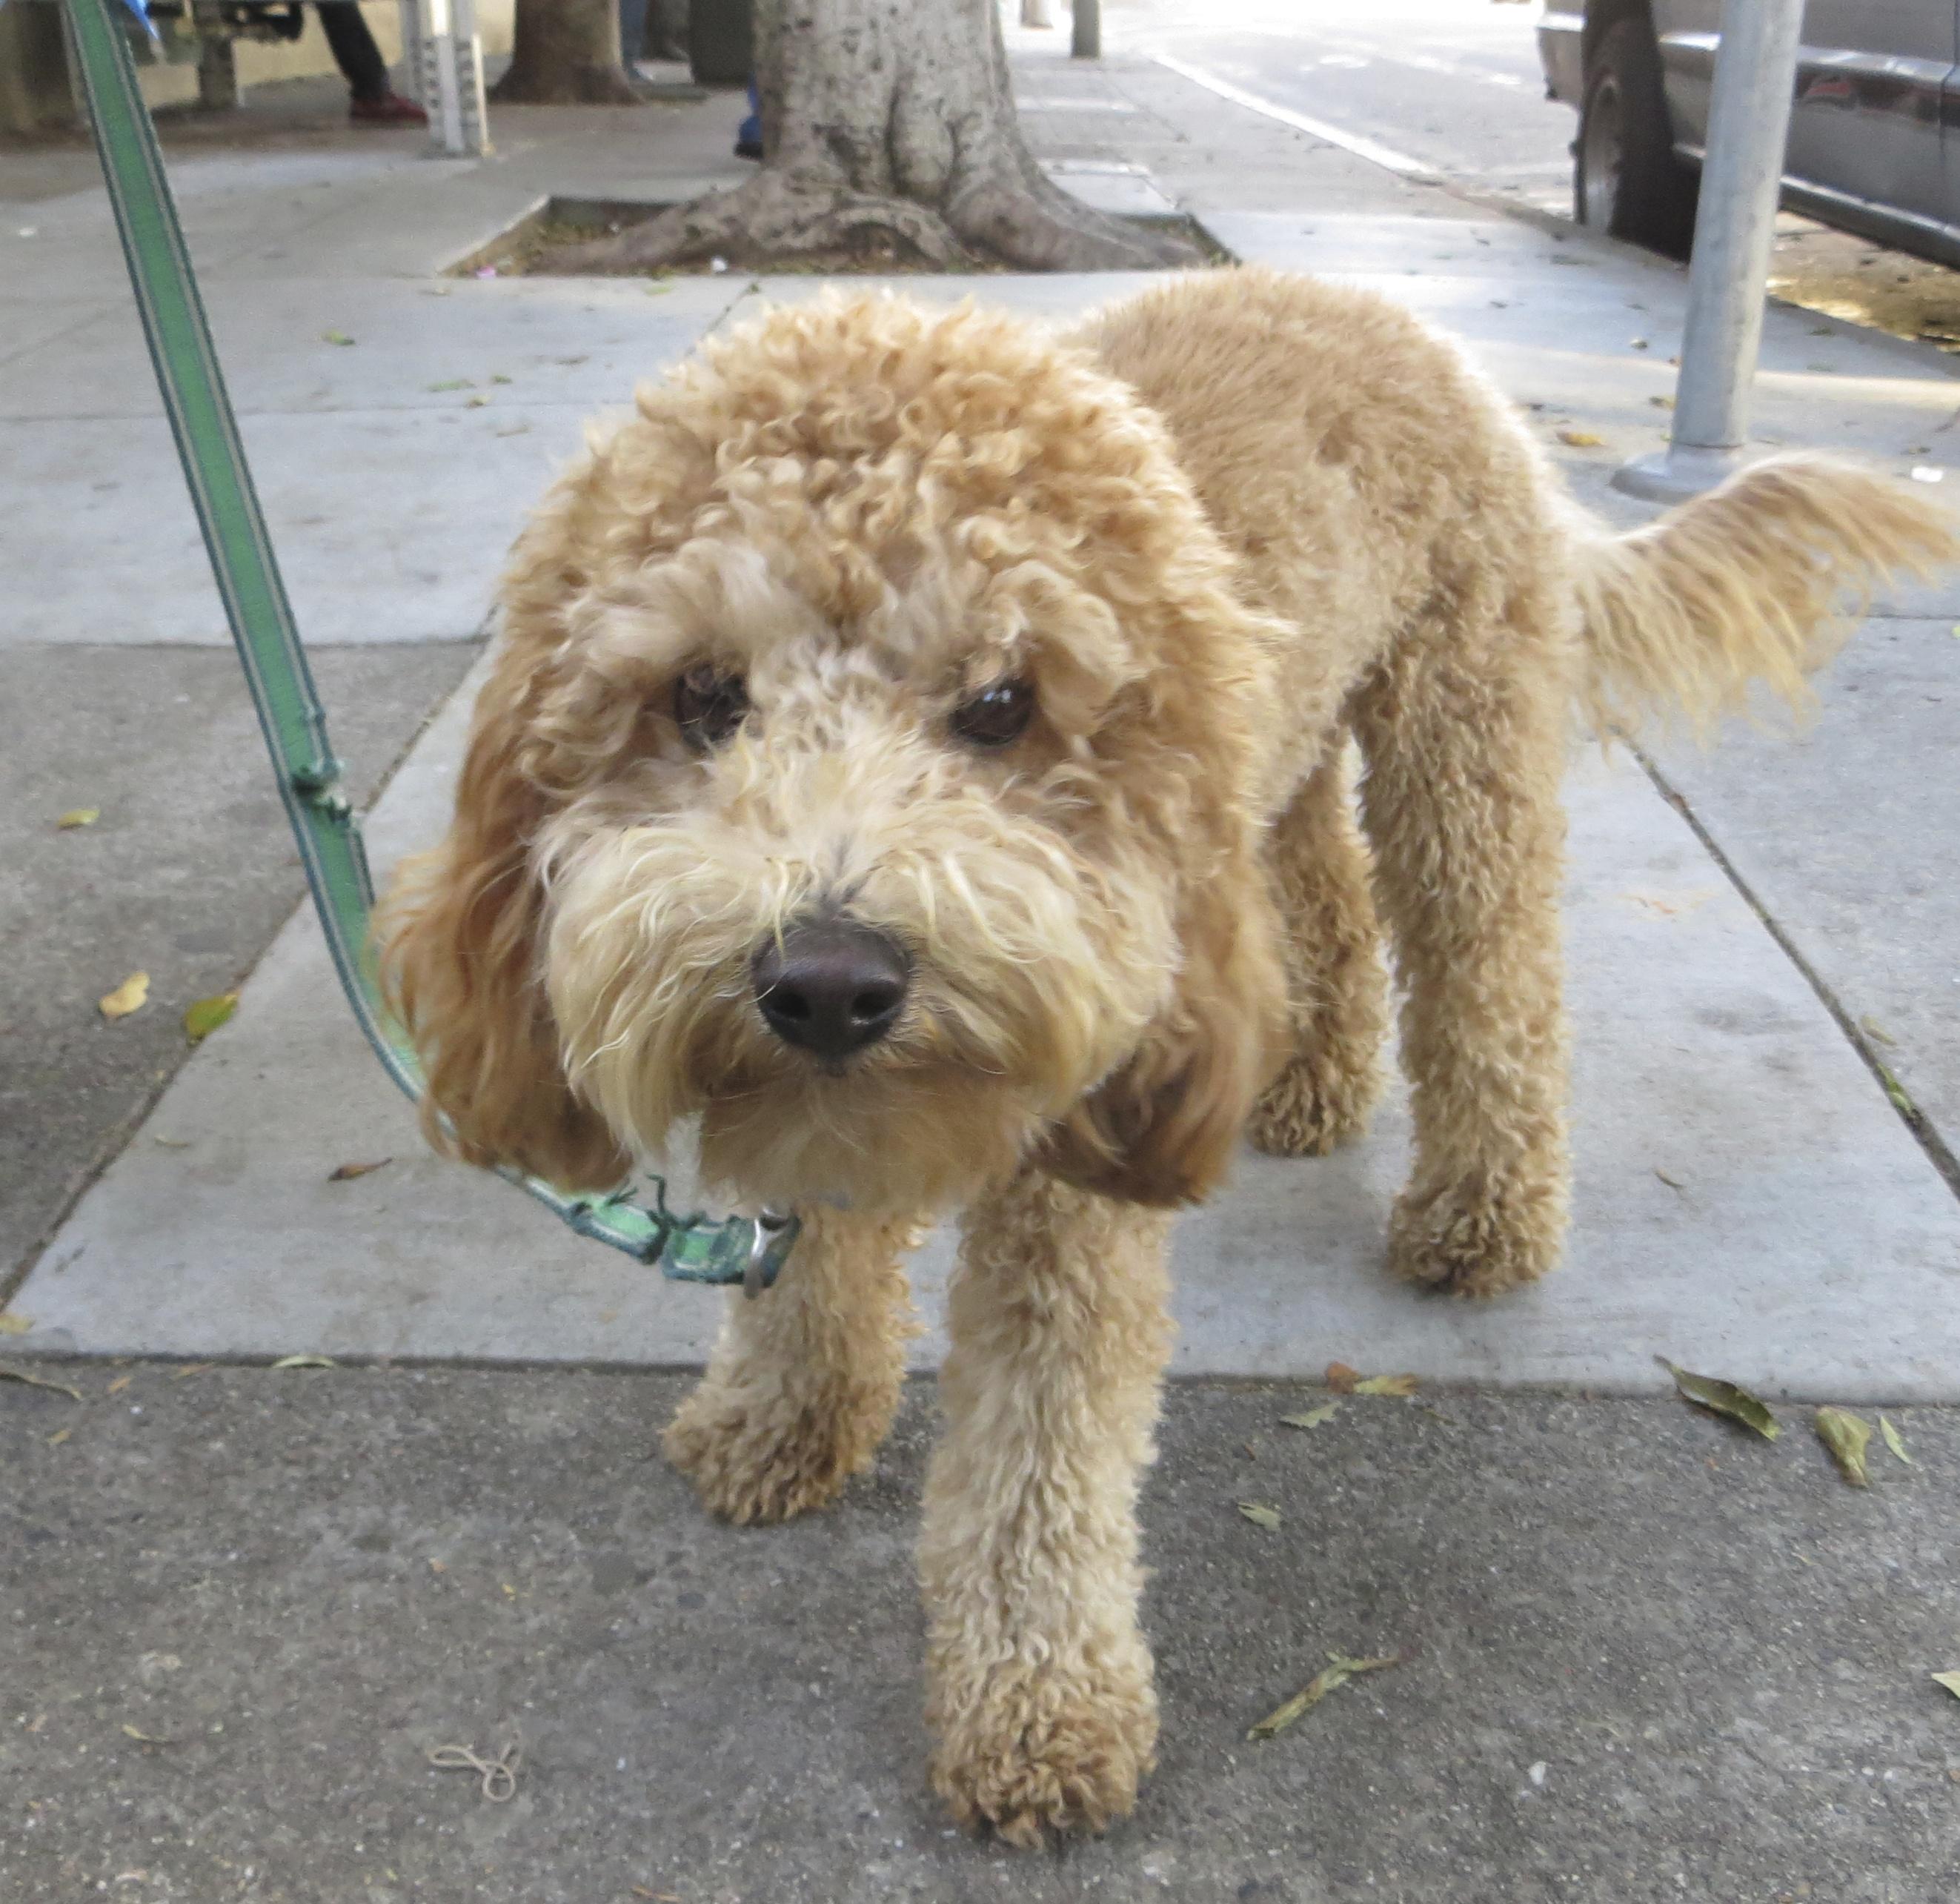 labradoodle labrador retriever and poodle mix - HD2645×2569